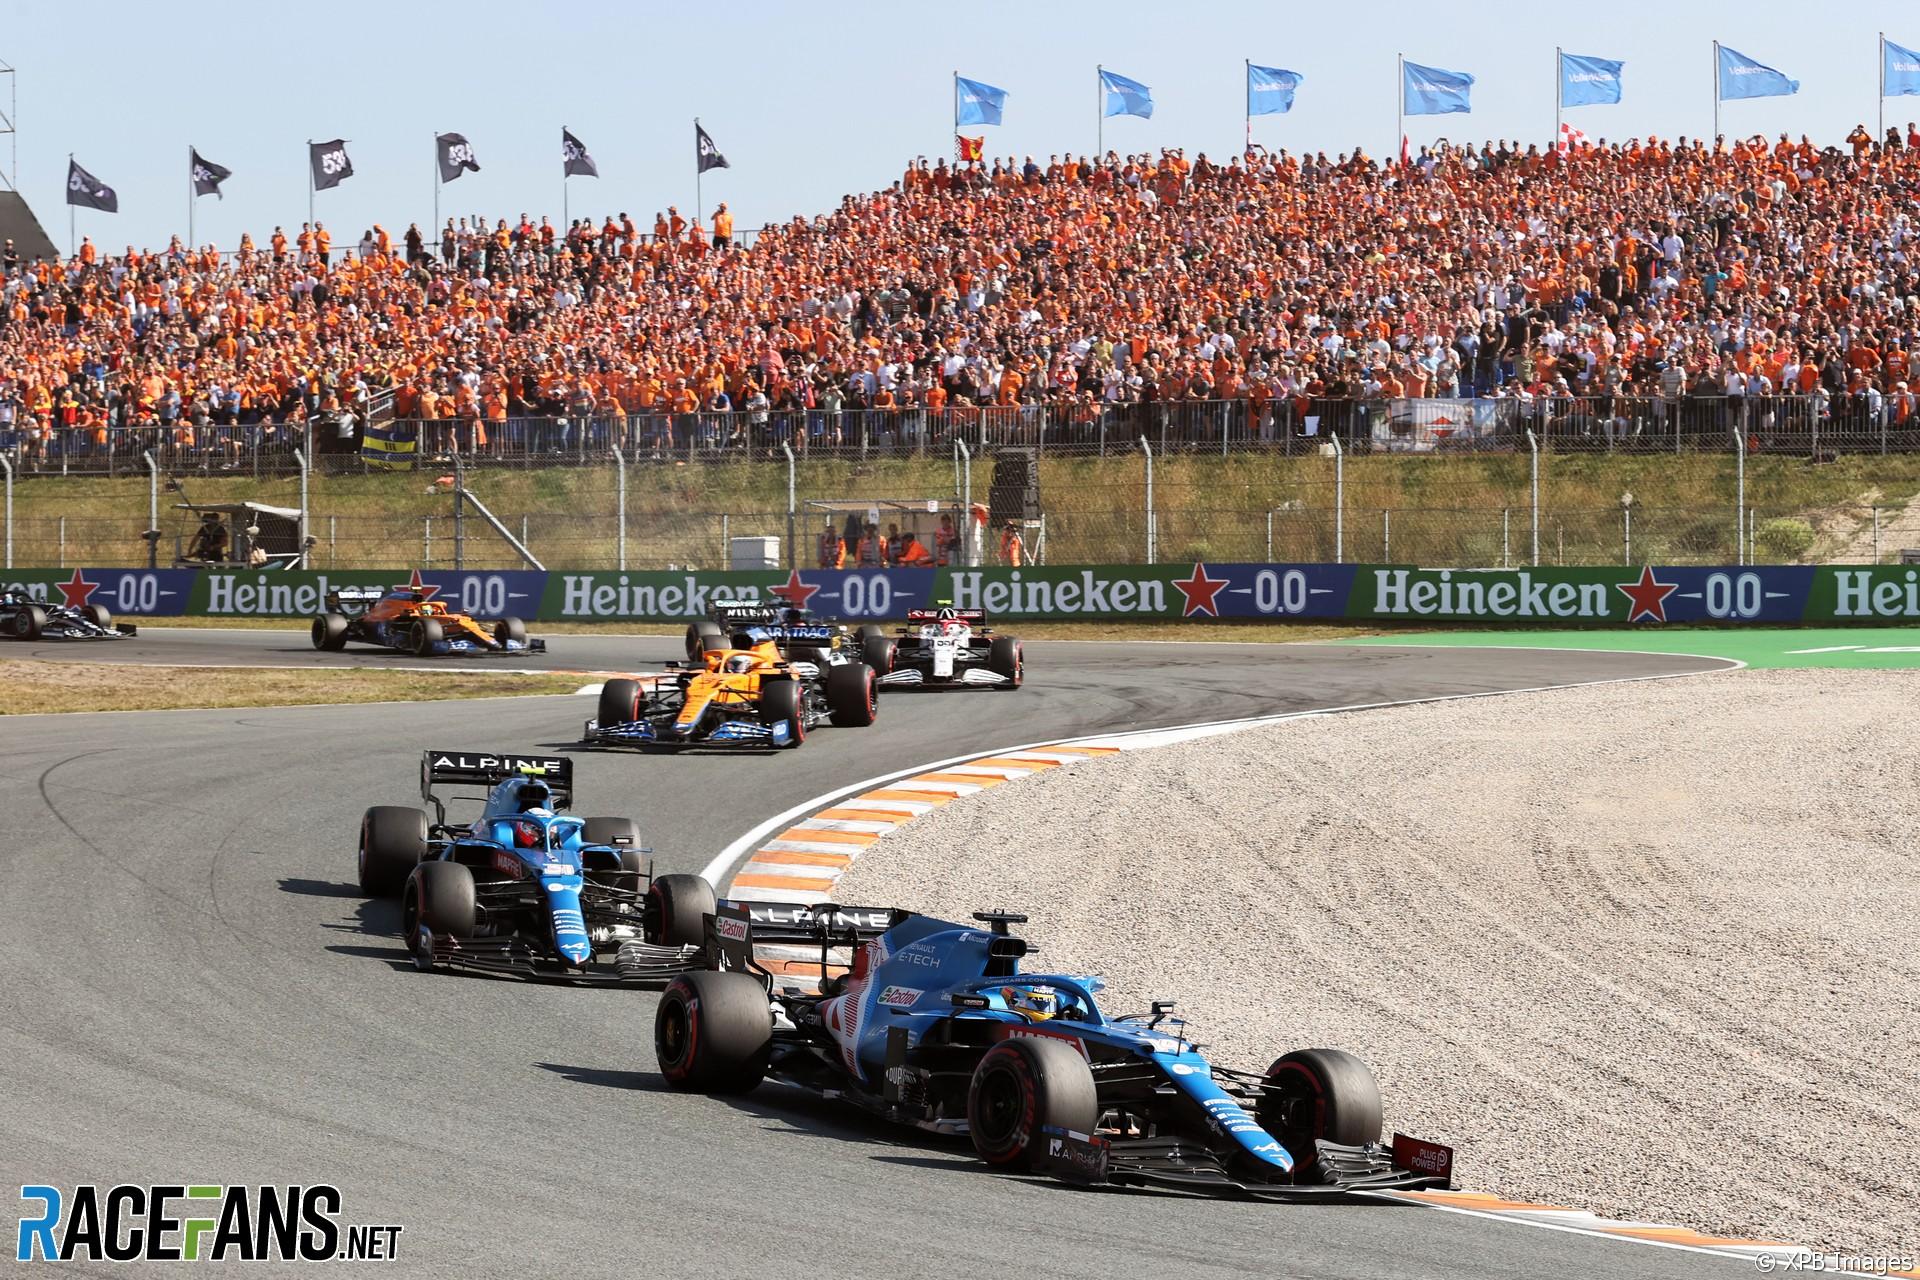 Fernando Alonso, Alpine, Zandvoort, 2021